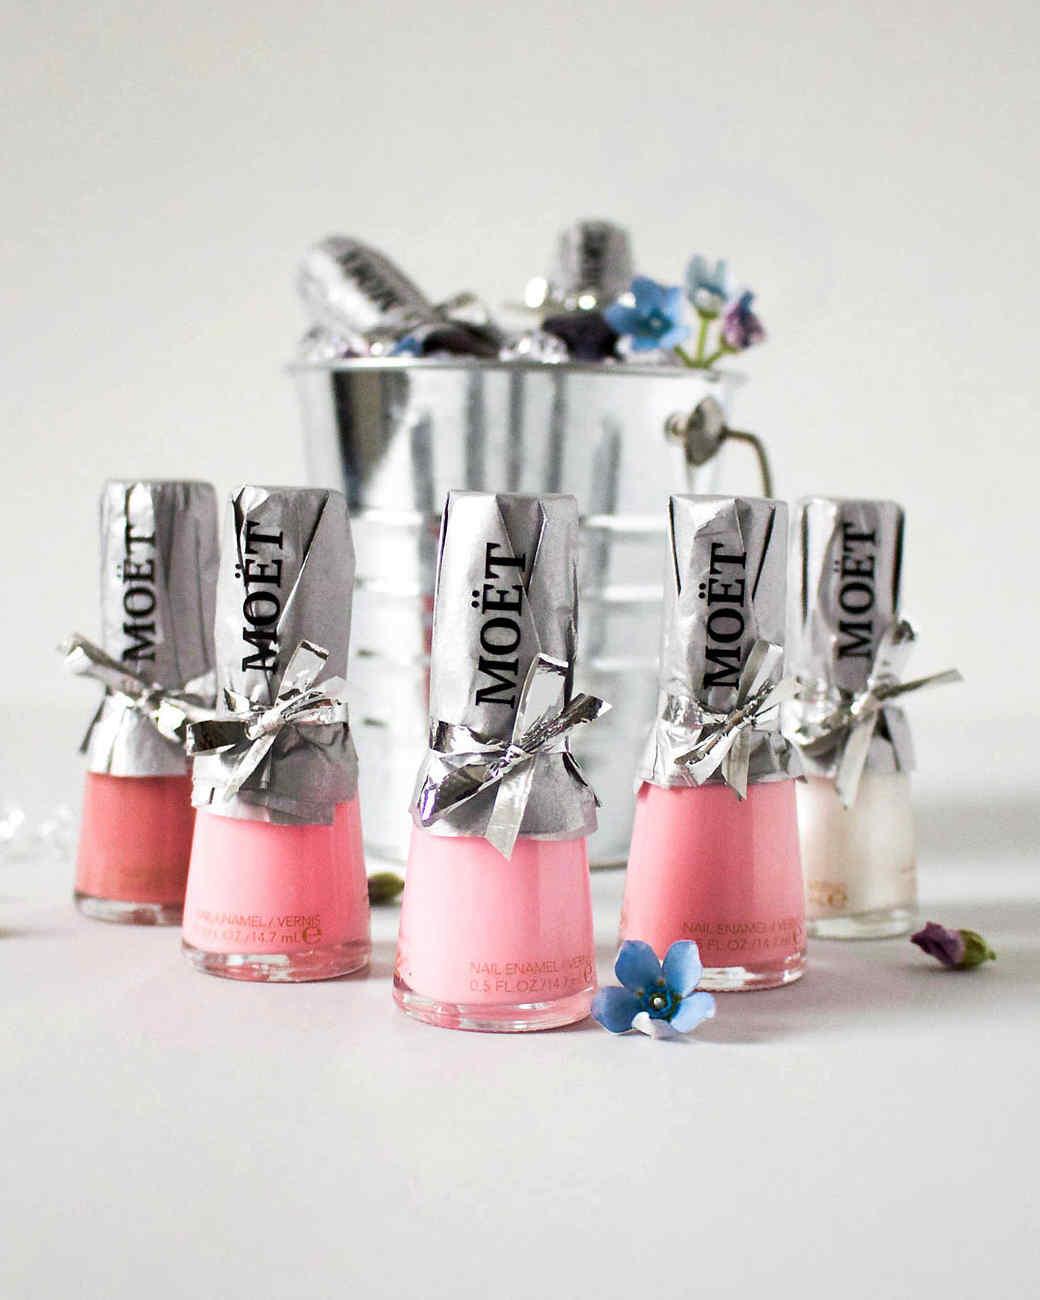 nail polish bottle bubbly party favors pink white